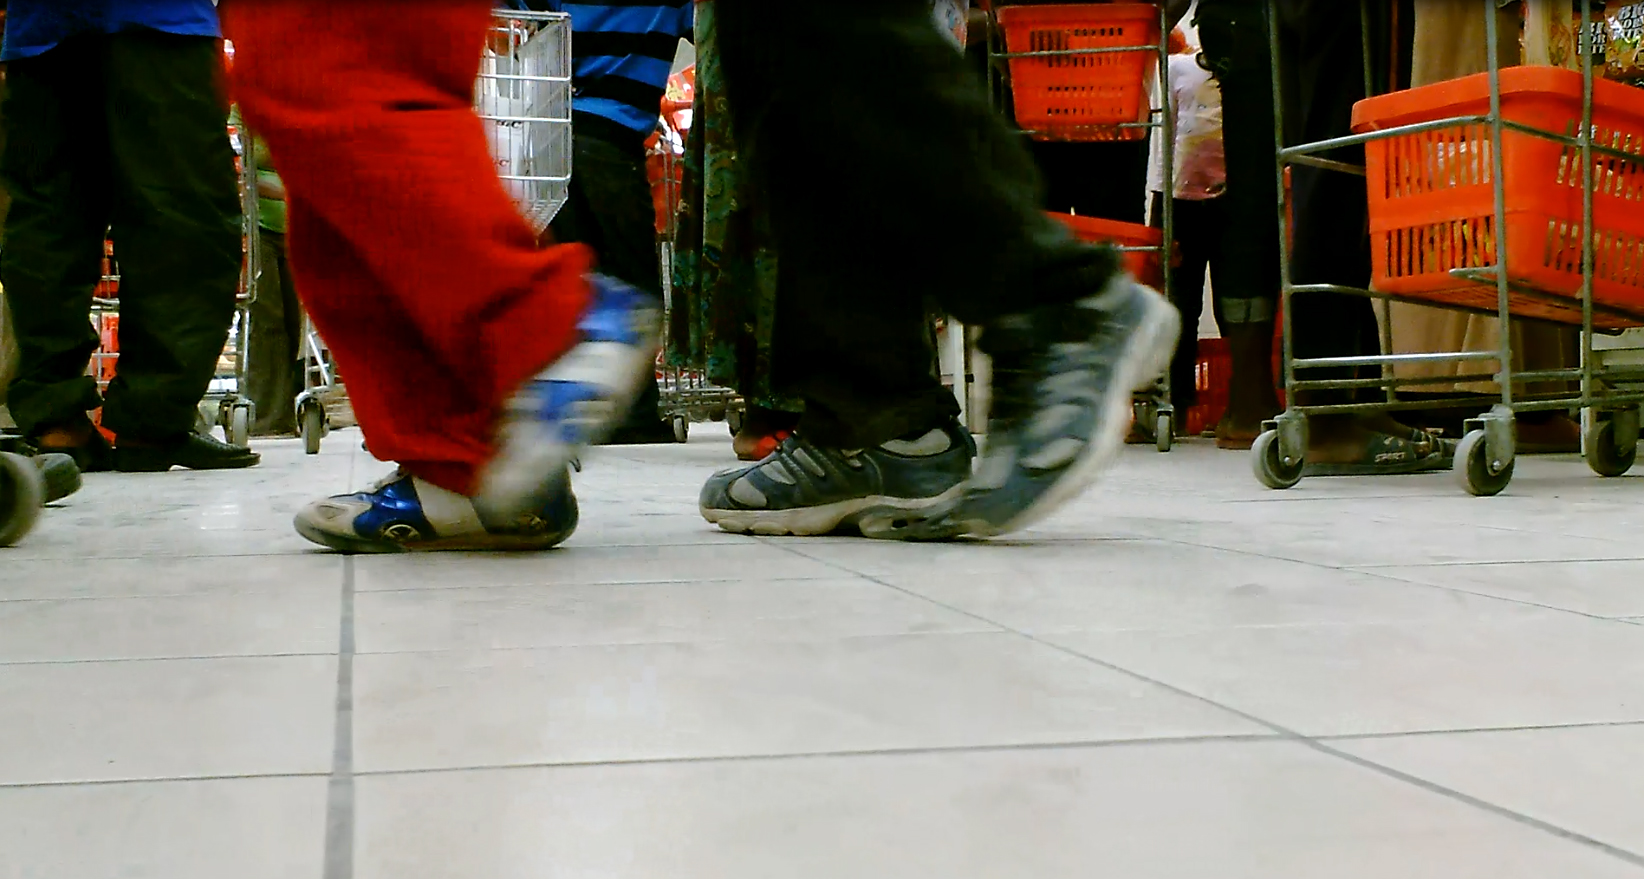 Feet-Pröpper-2013-8